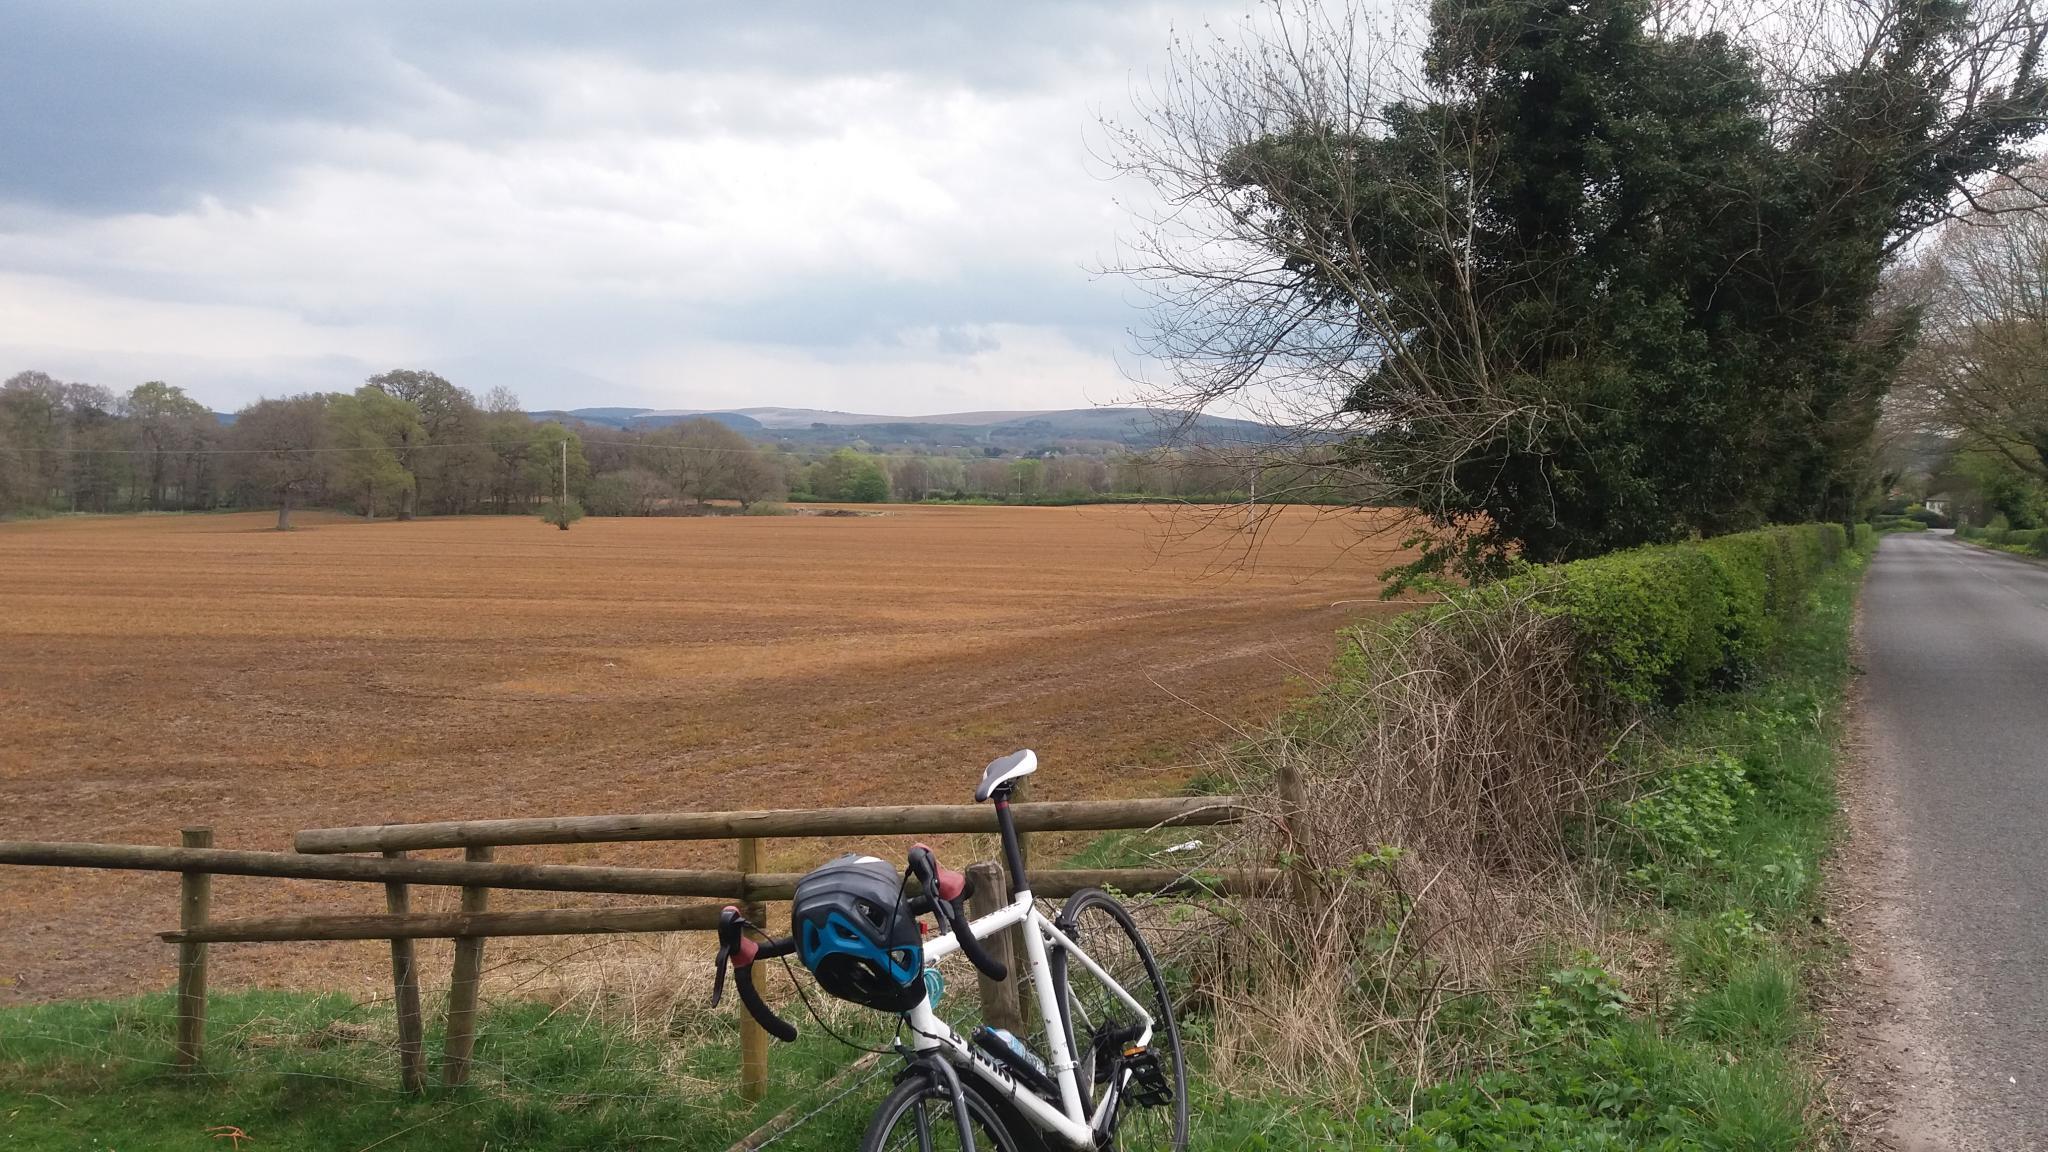 On my bike-20200412_153412-jpg